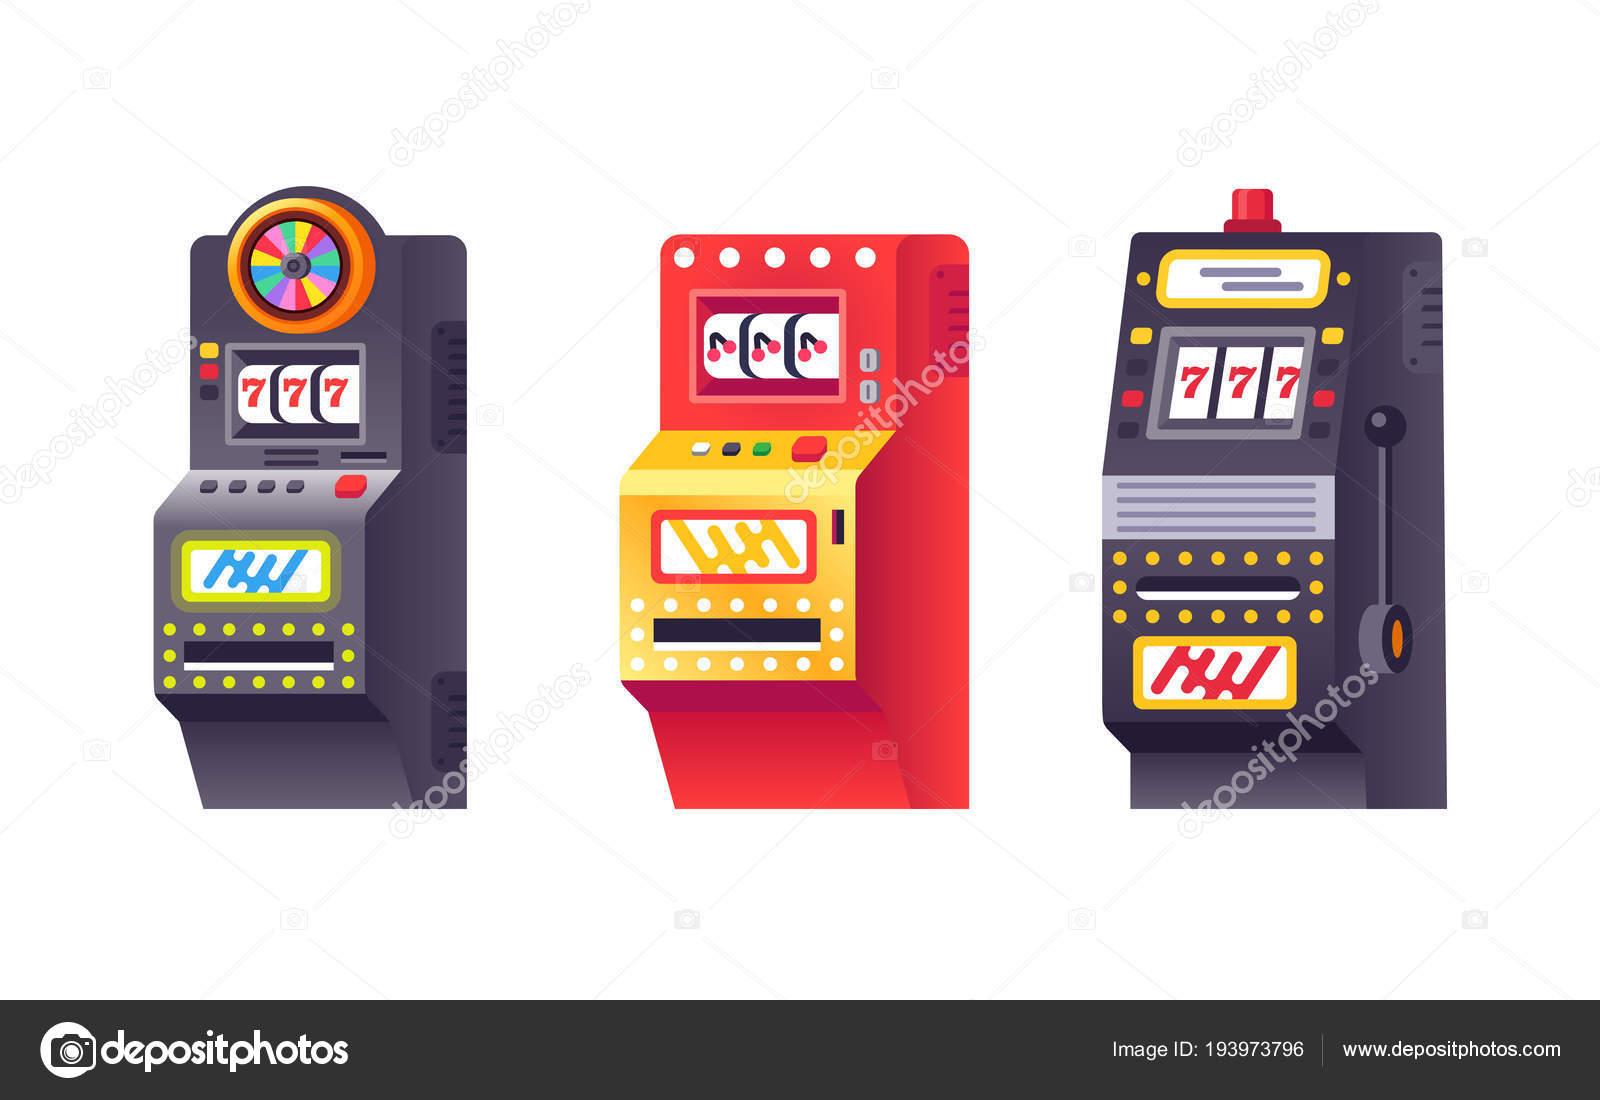 Columbus deluxe автоматы